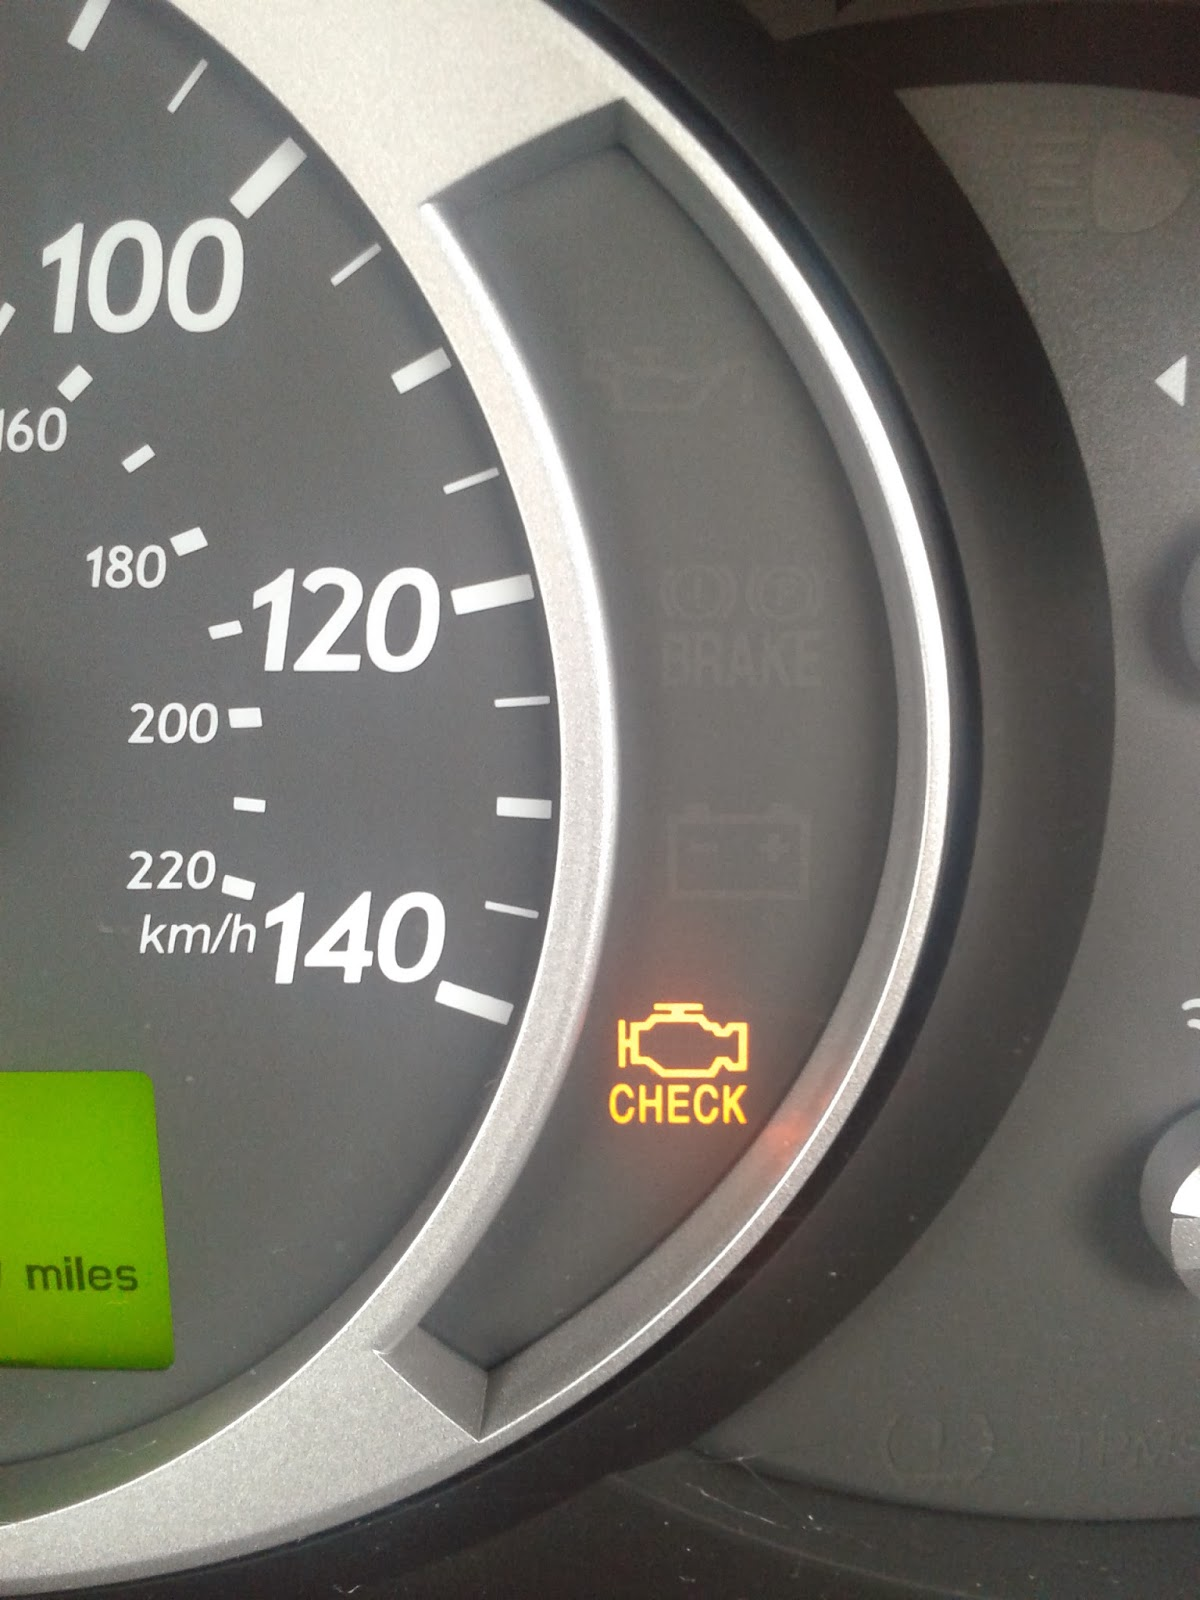 Hyundai Engine Light On Related Keywords & Suggestions